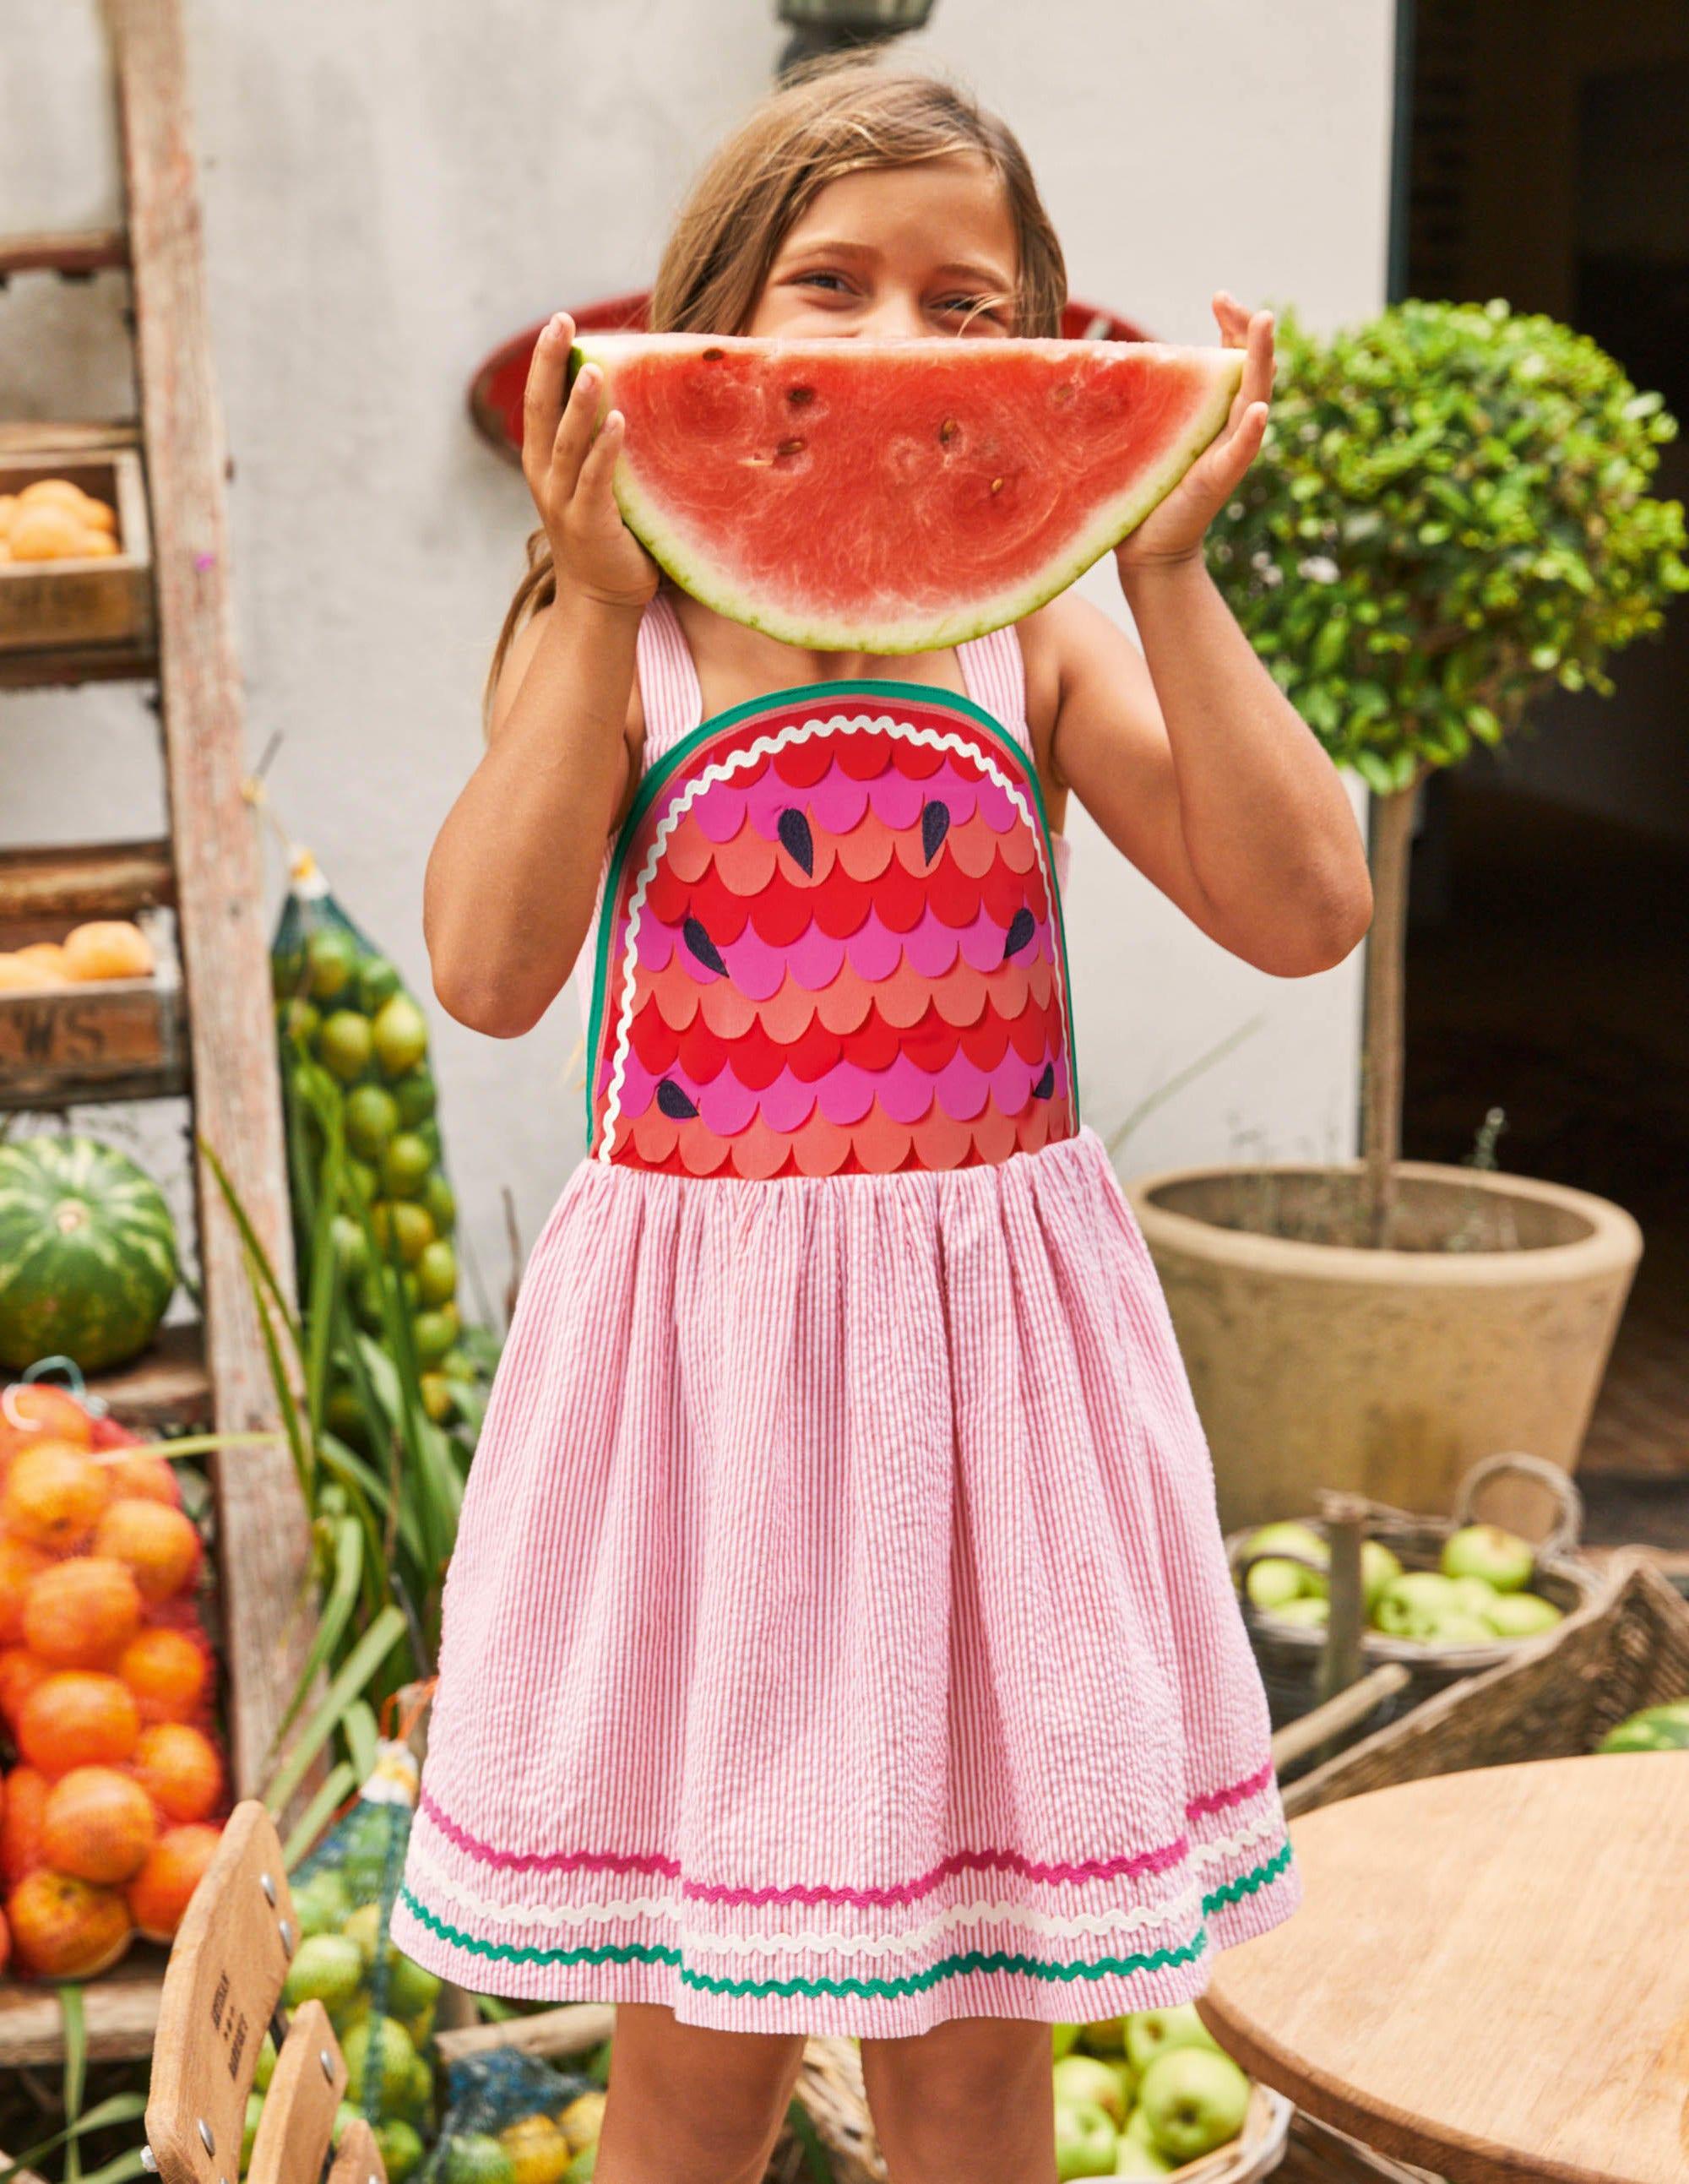 Boden Watermelon Embellished Dress - Strawberry Tart Red Ticking